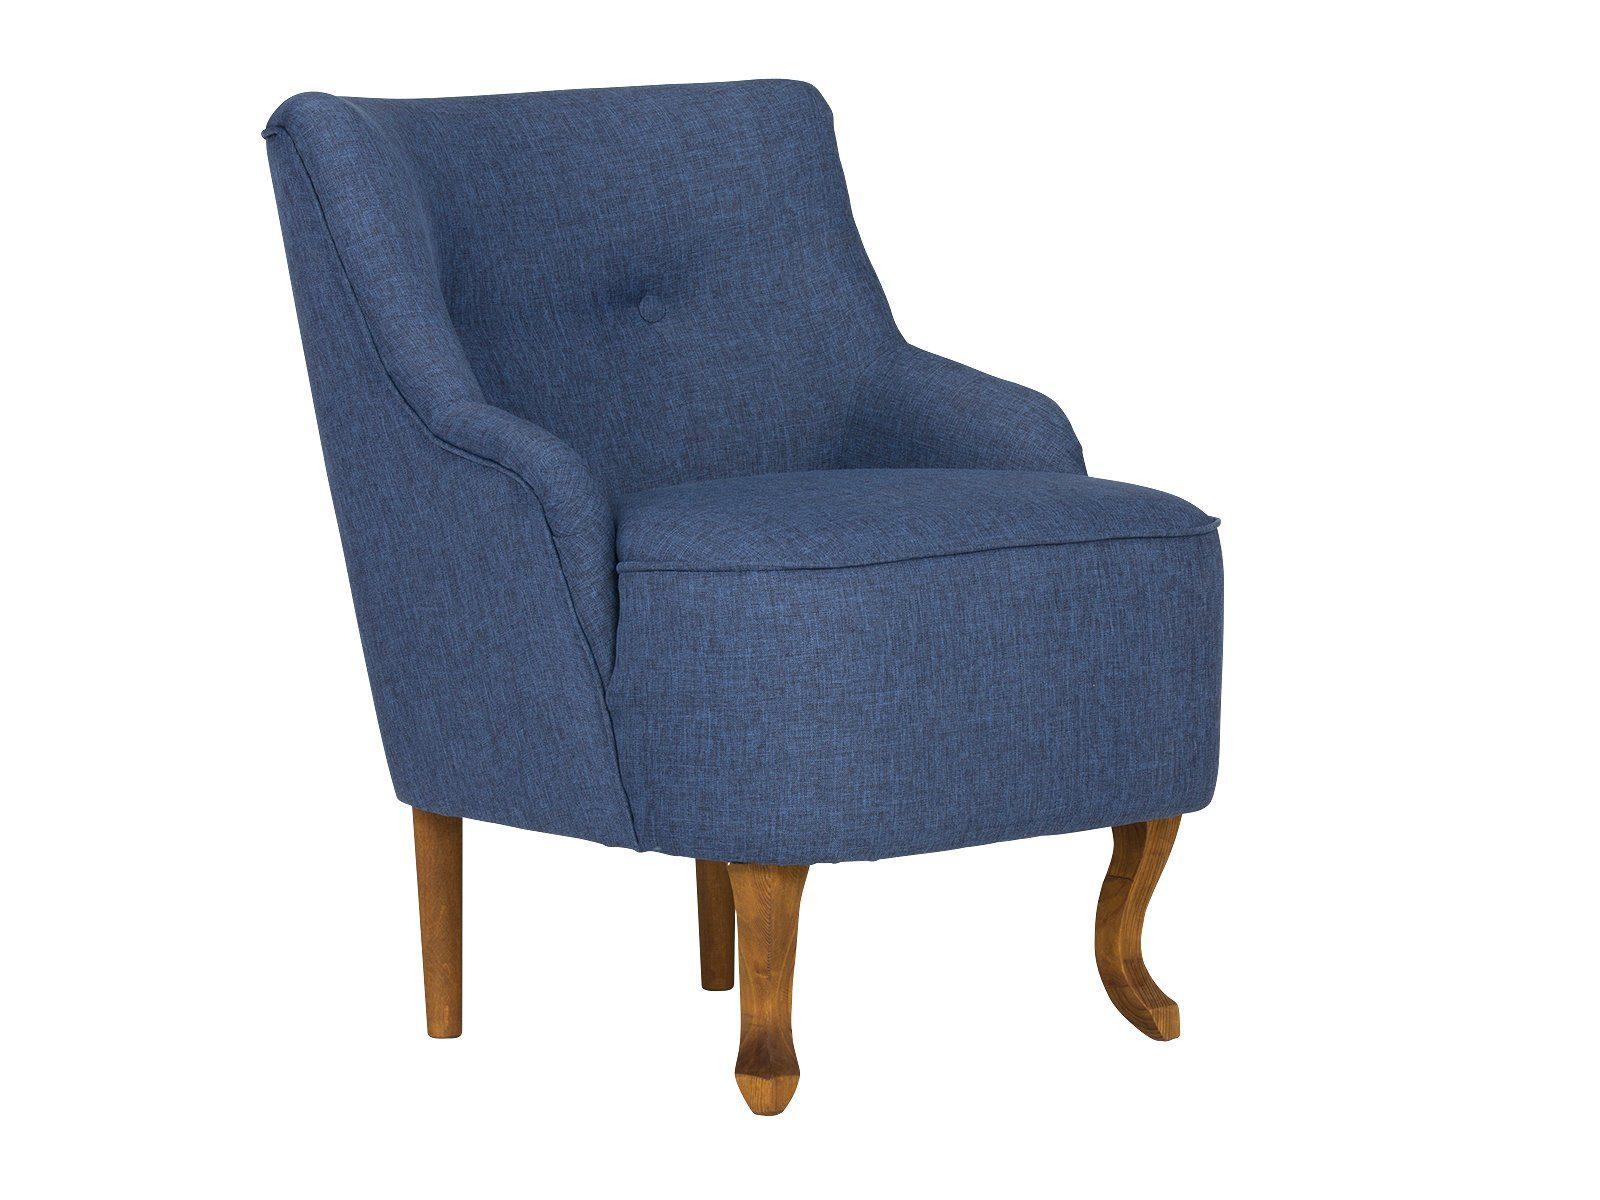 massivum Sessel aus Flachgewebe »Eraton«